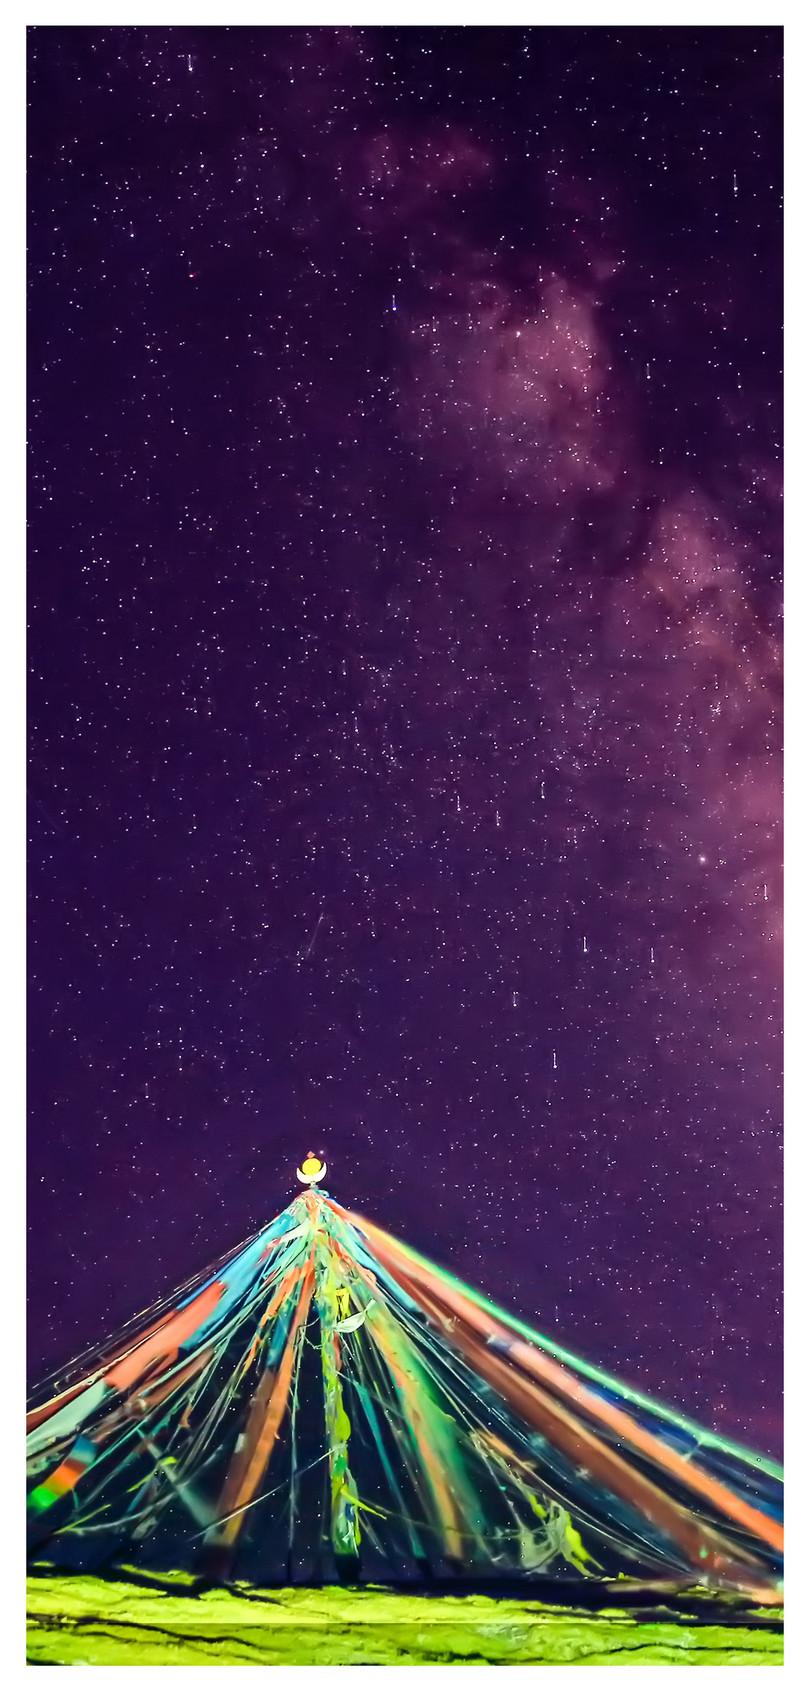 Unduh 9000 Wallpaper Bintang HD Terbaru